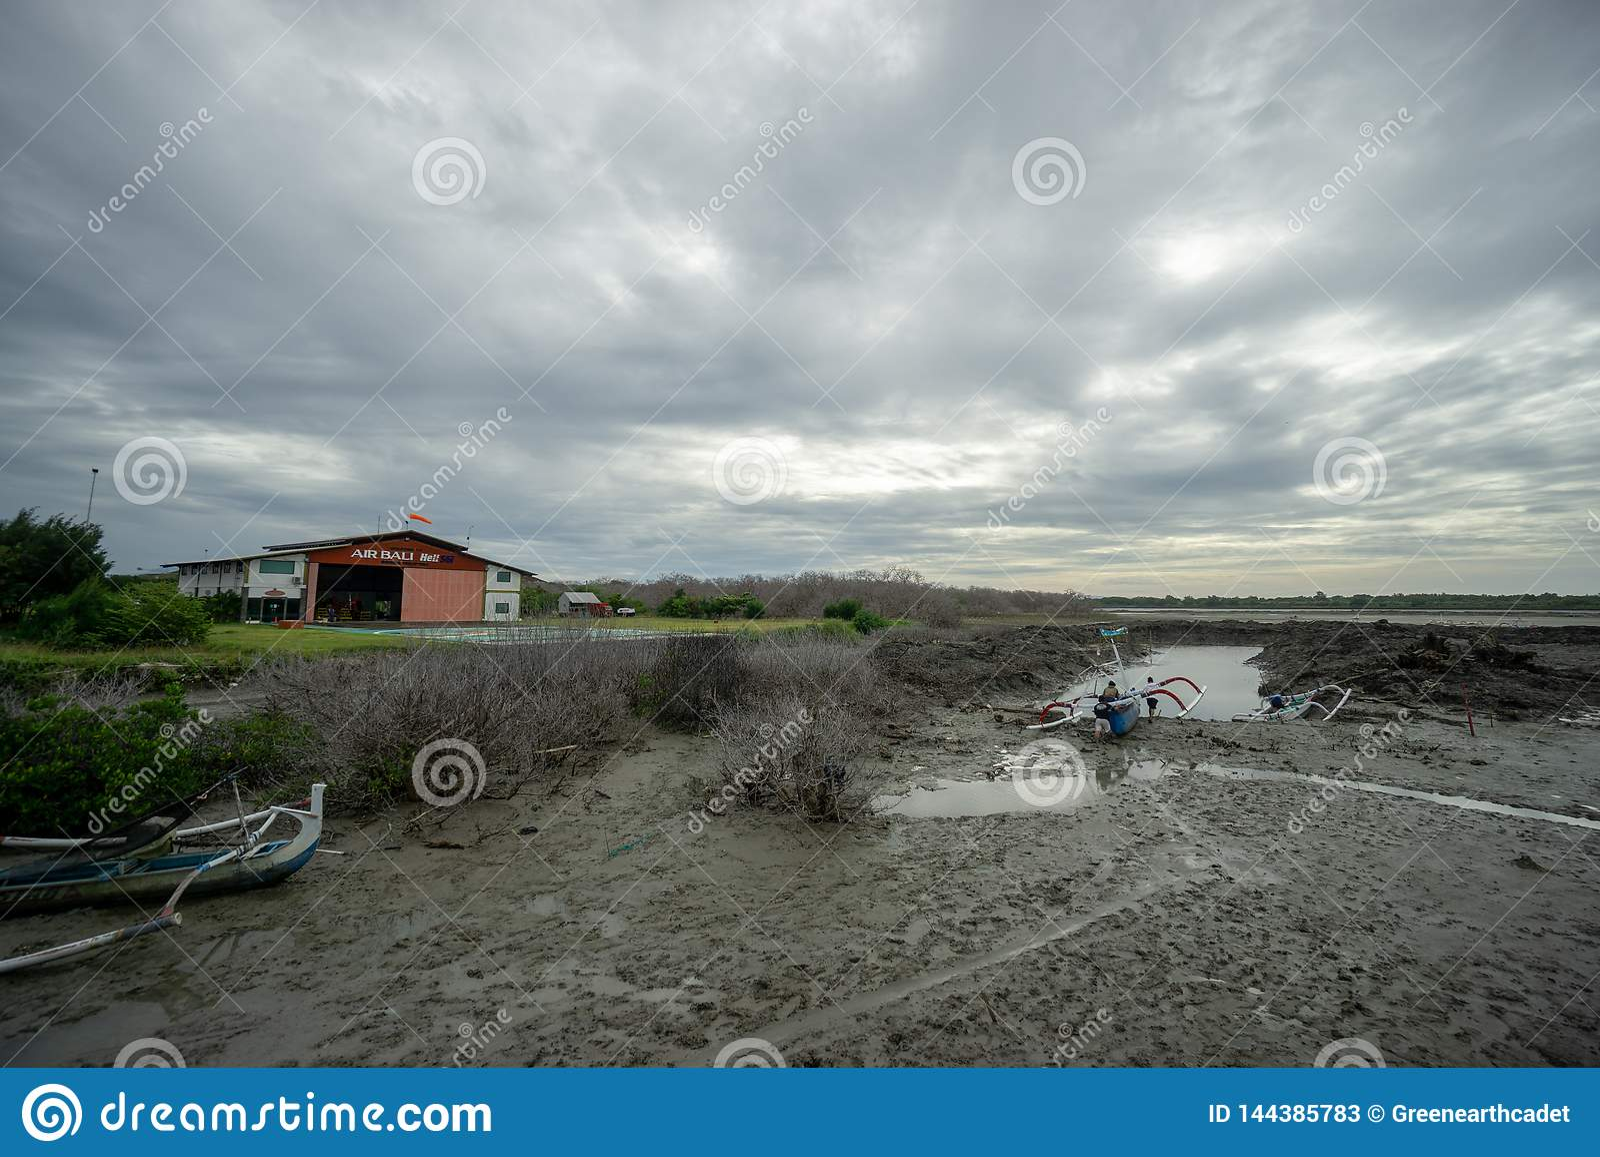 BADUNG, BALI/INDONESIA- 8 ΜΑΡΤΊΟΥ 2019: Βάρκα ψαράδων που κολλιέται στη λάσπη λόγω της χαμηλής παλίρροιας σε Benoa